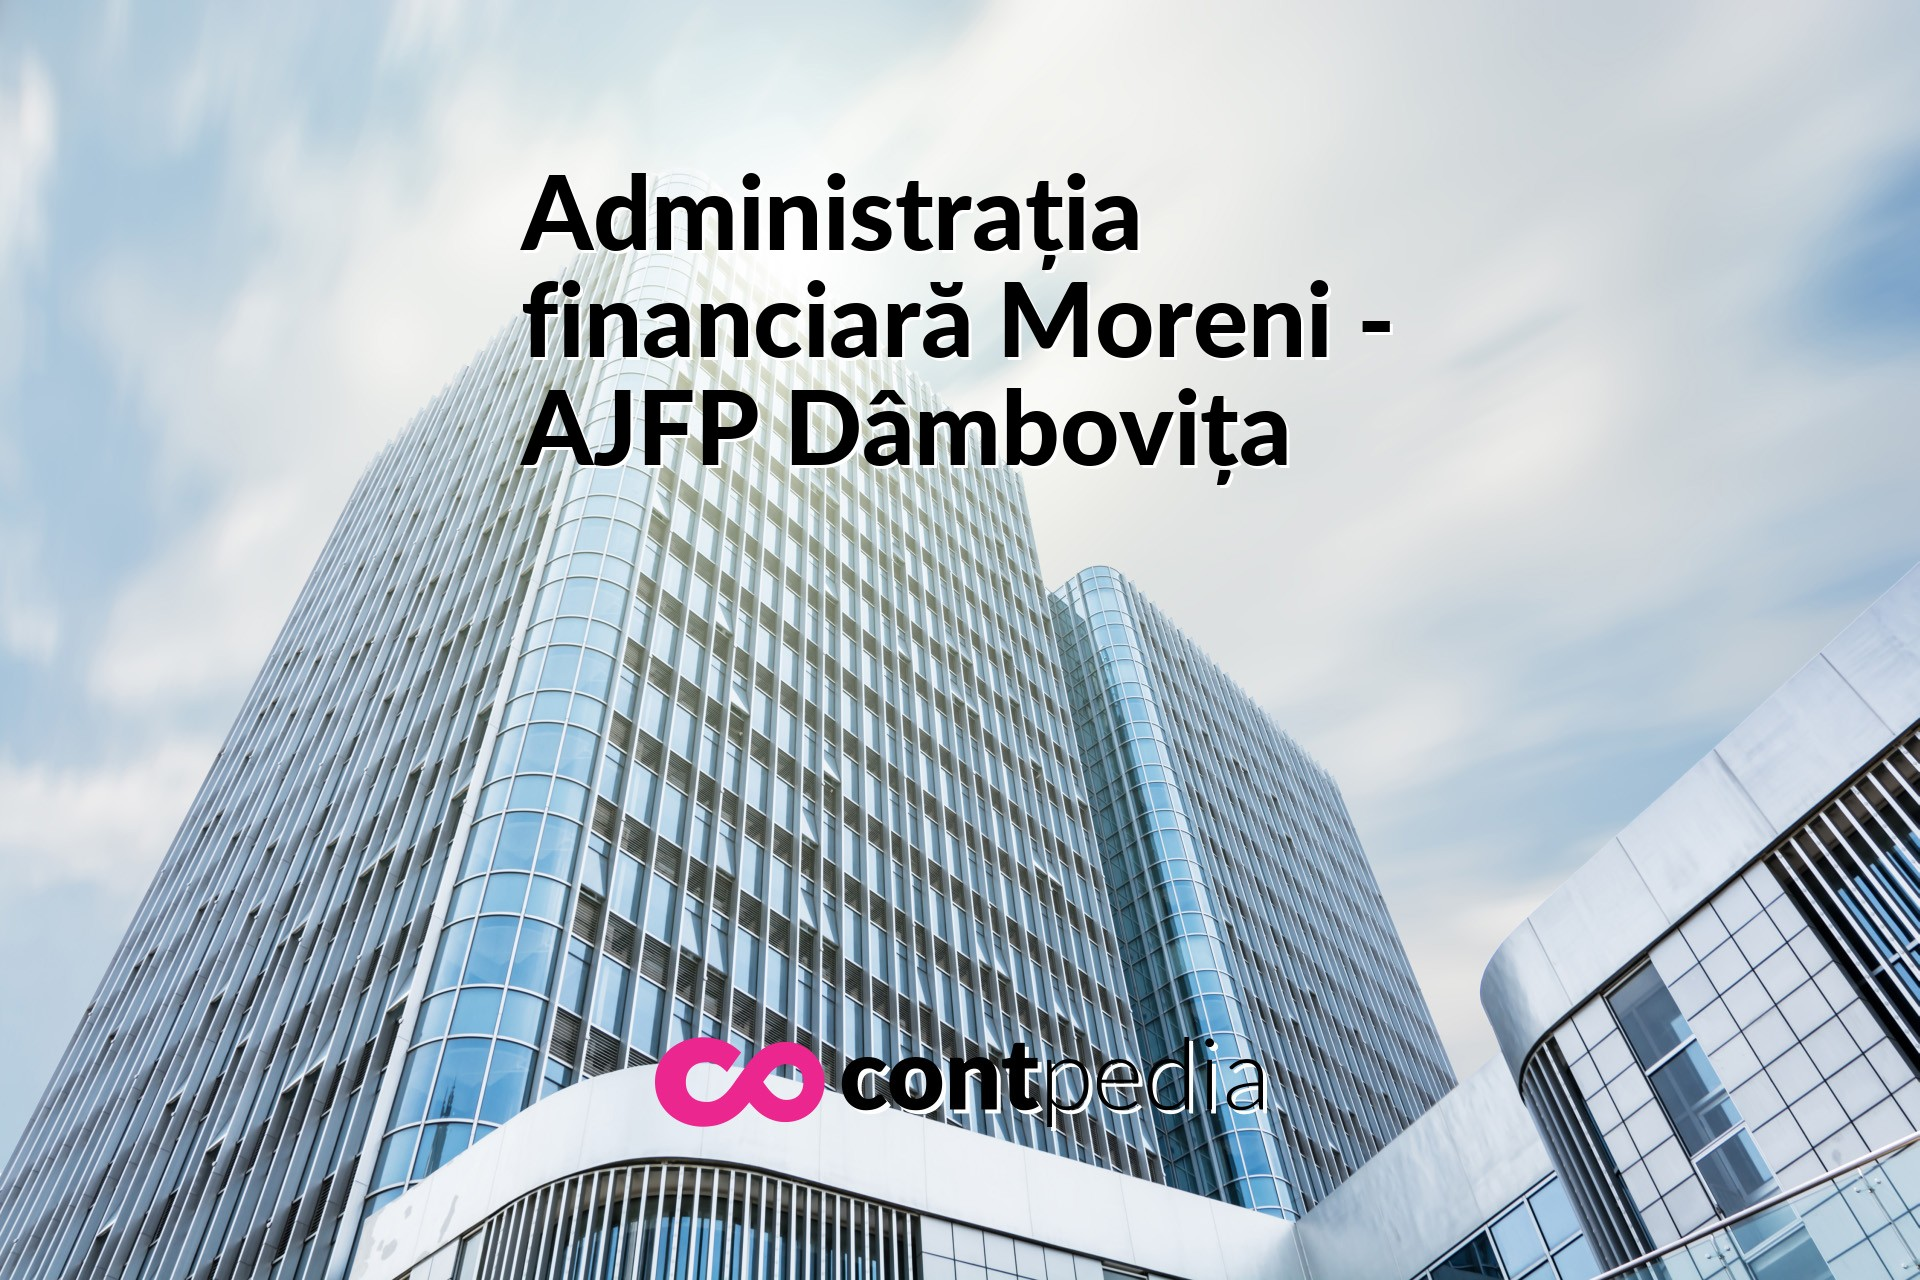 Administrația Financiară Moreni Ajfp Dambovița Harta Adresă